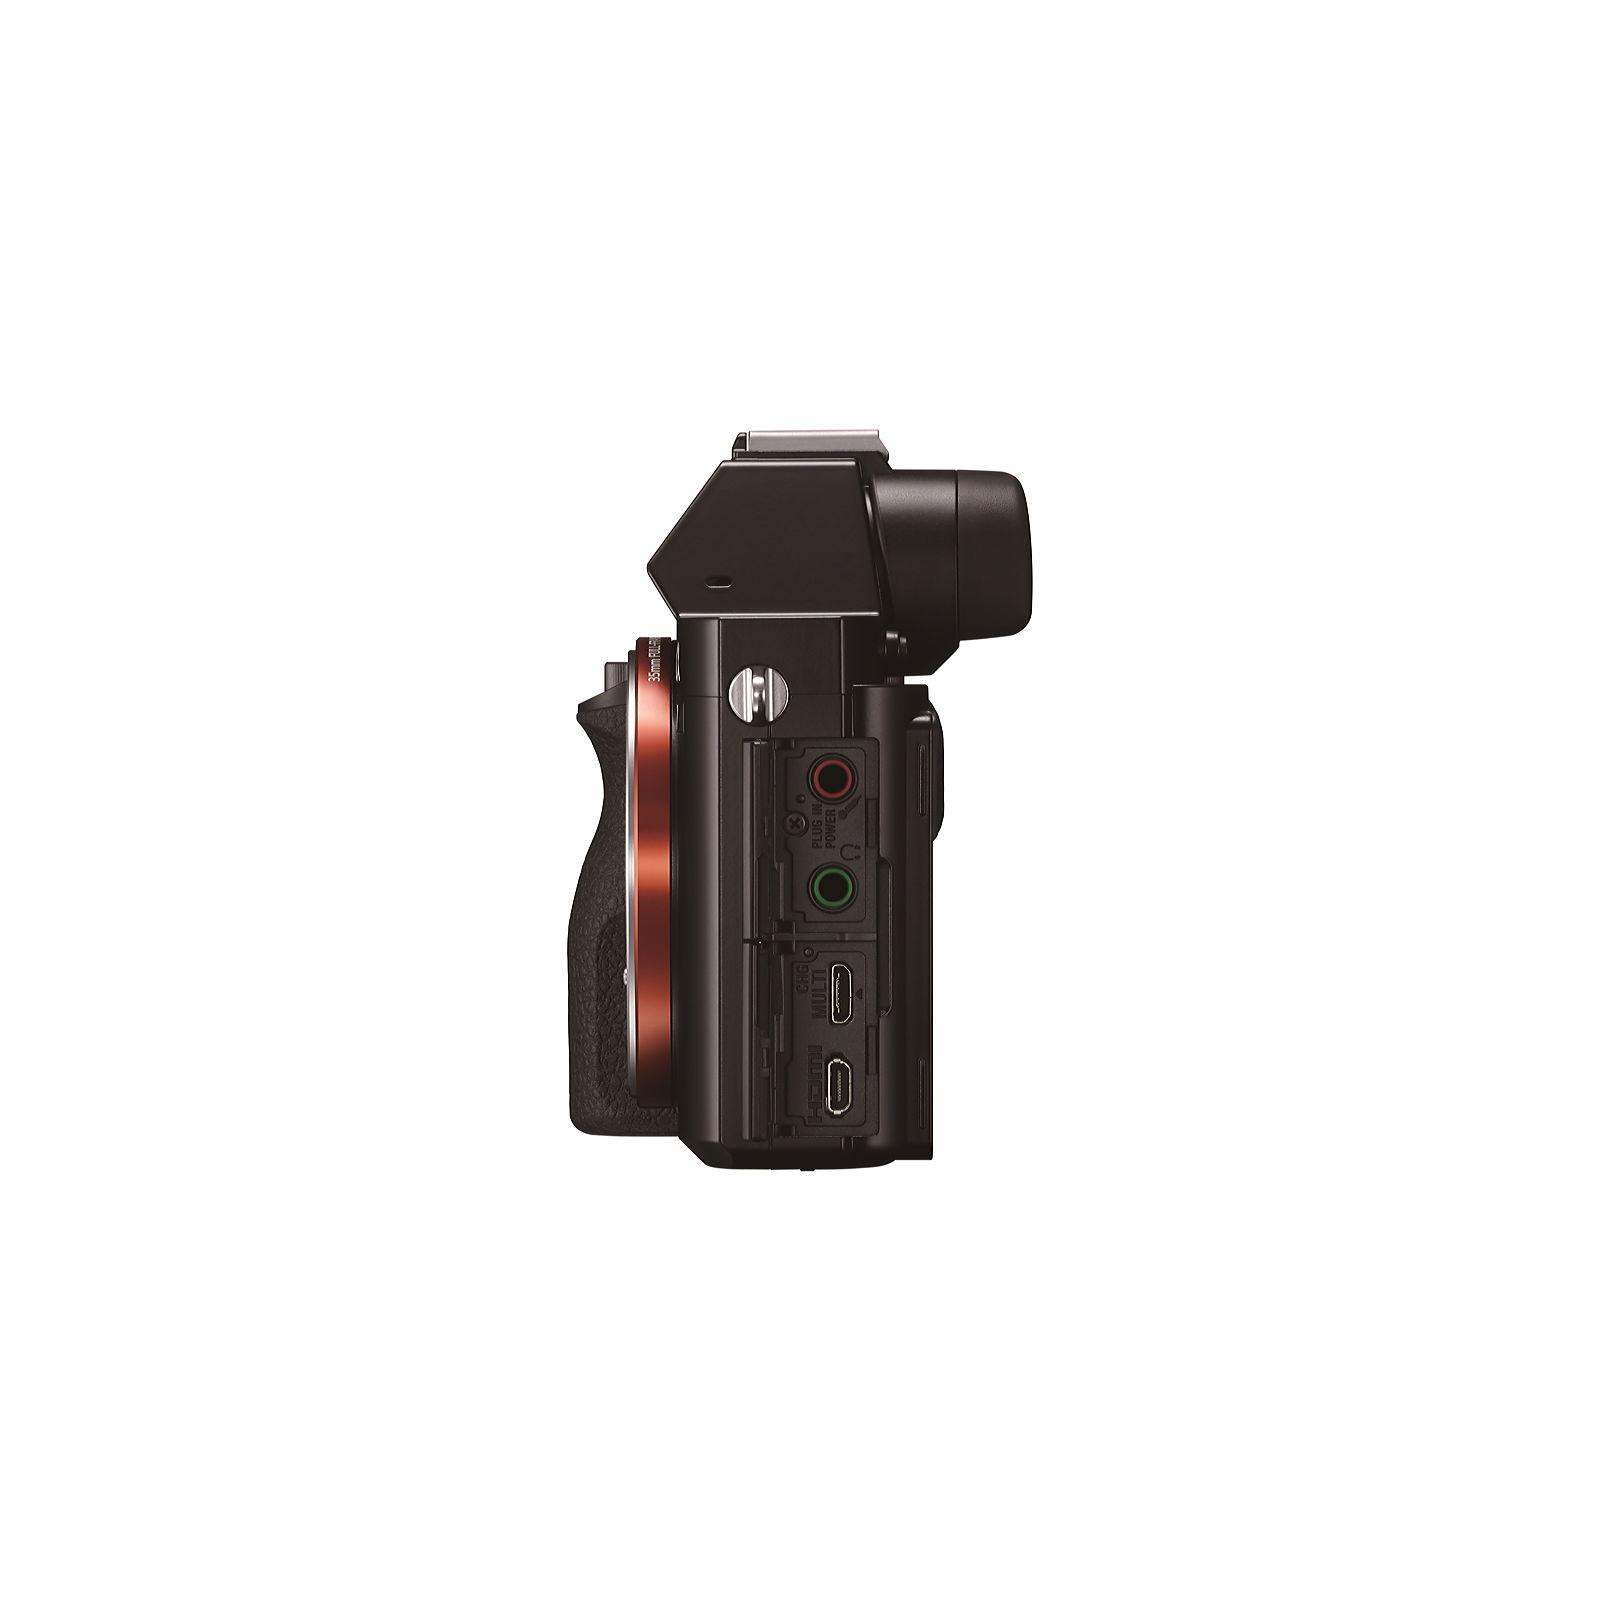 Цифровой фотоаппарат SONY Alpha 7 28-70 kit black (ILCE7KB.RU2) изображение 7